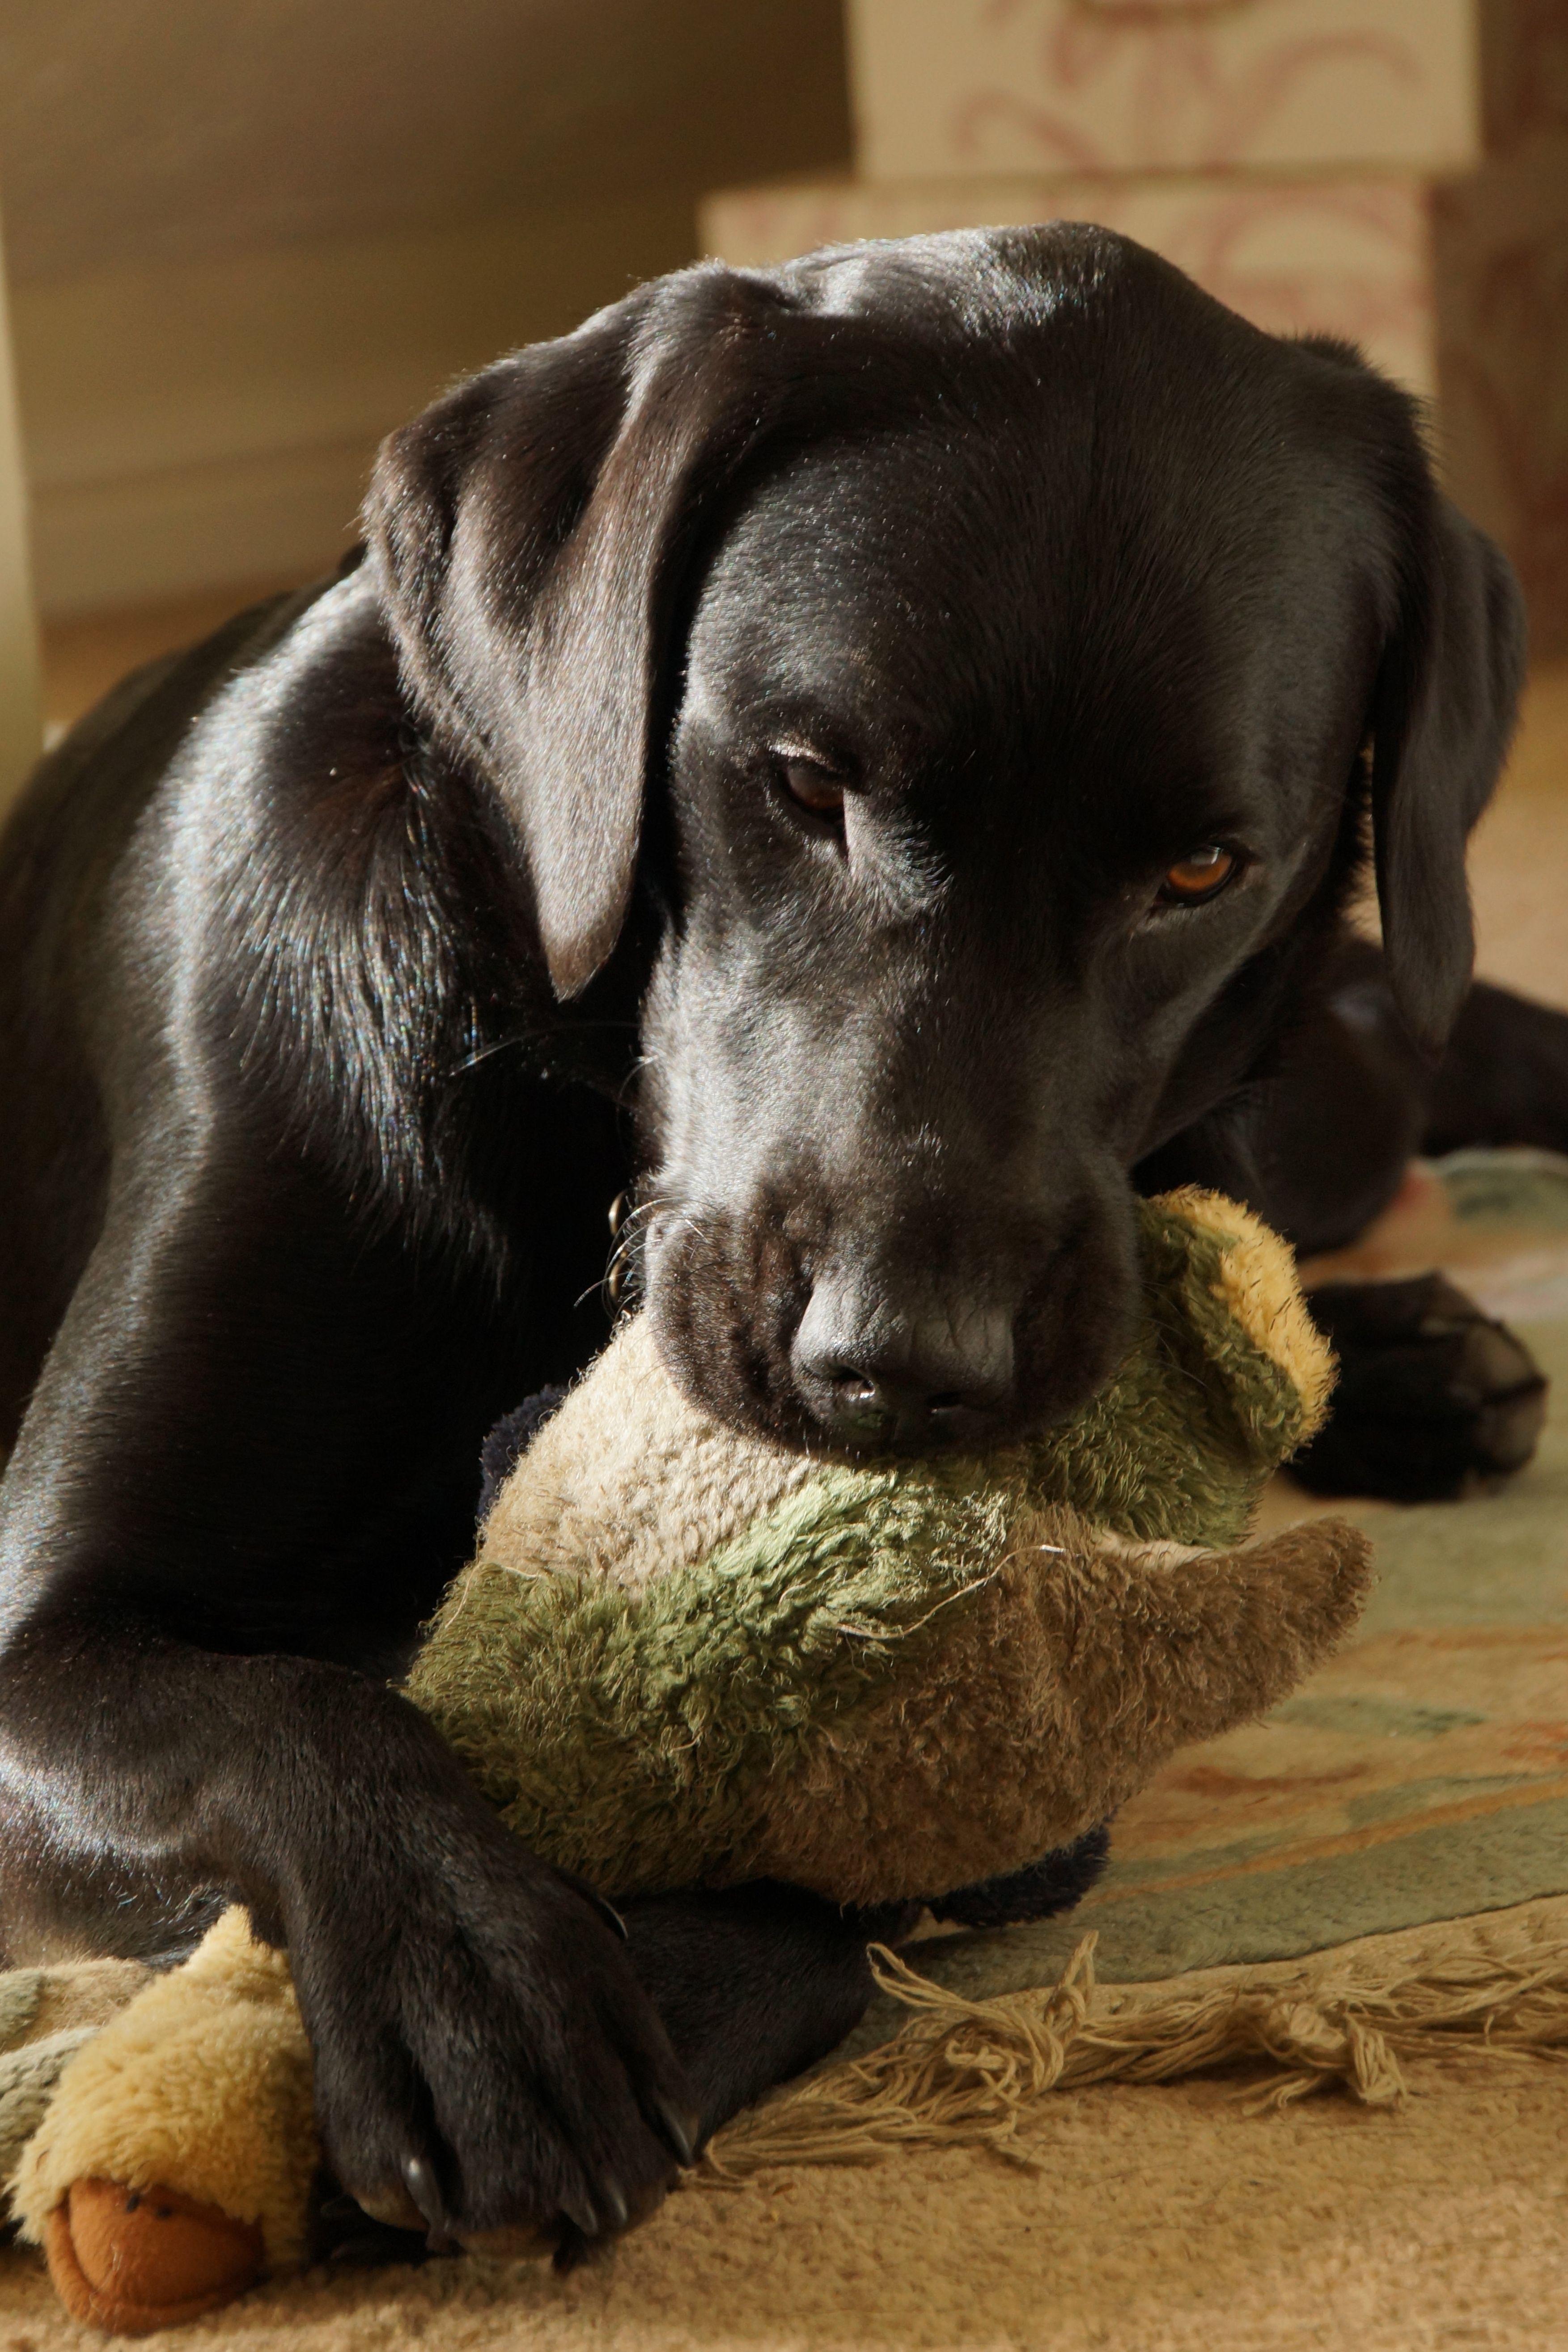 Young Black Labrador suckling her duck toy Labrador